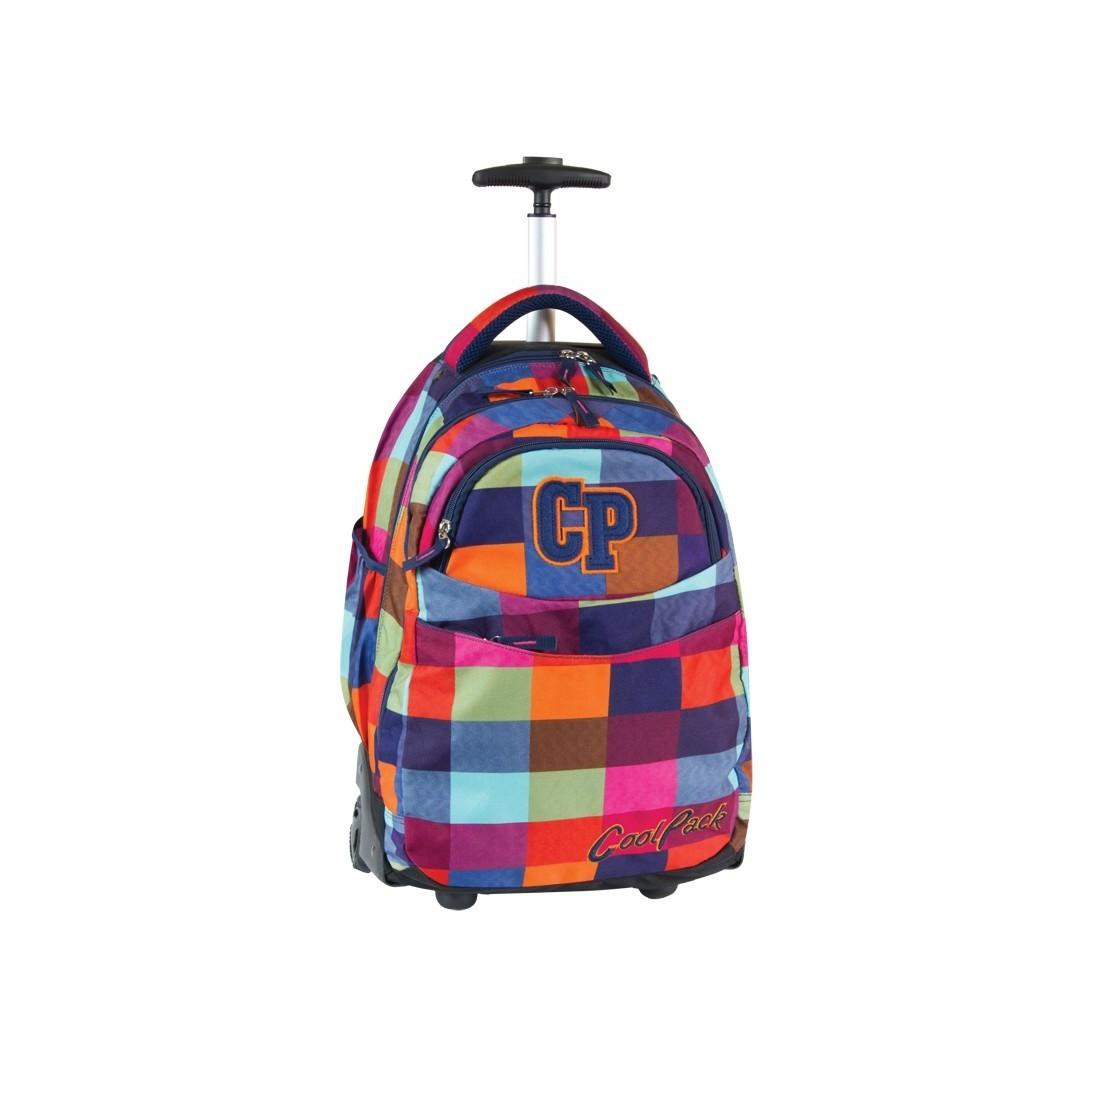 Plecak CoolPack na kółkach młodzieżowy w kratkę - RAPID MOSAIC CP 003 - plecak-tornister.pl